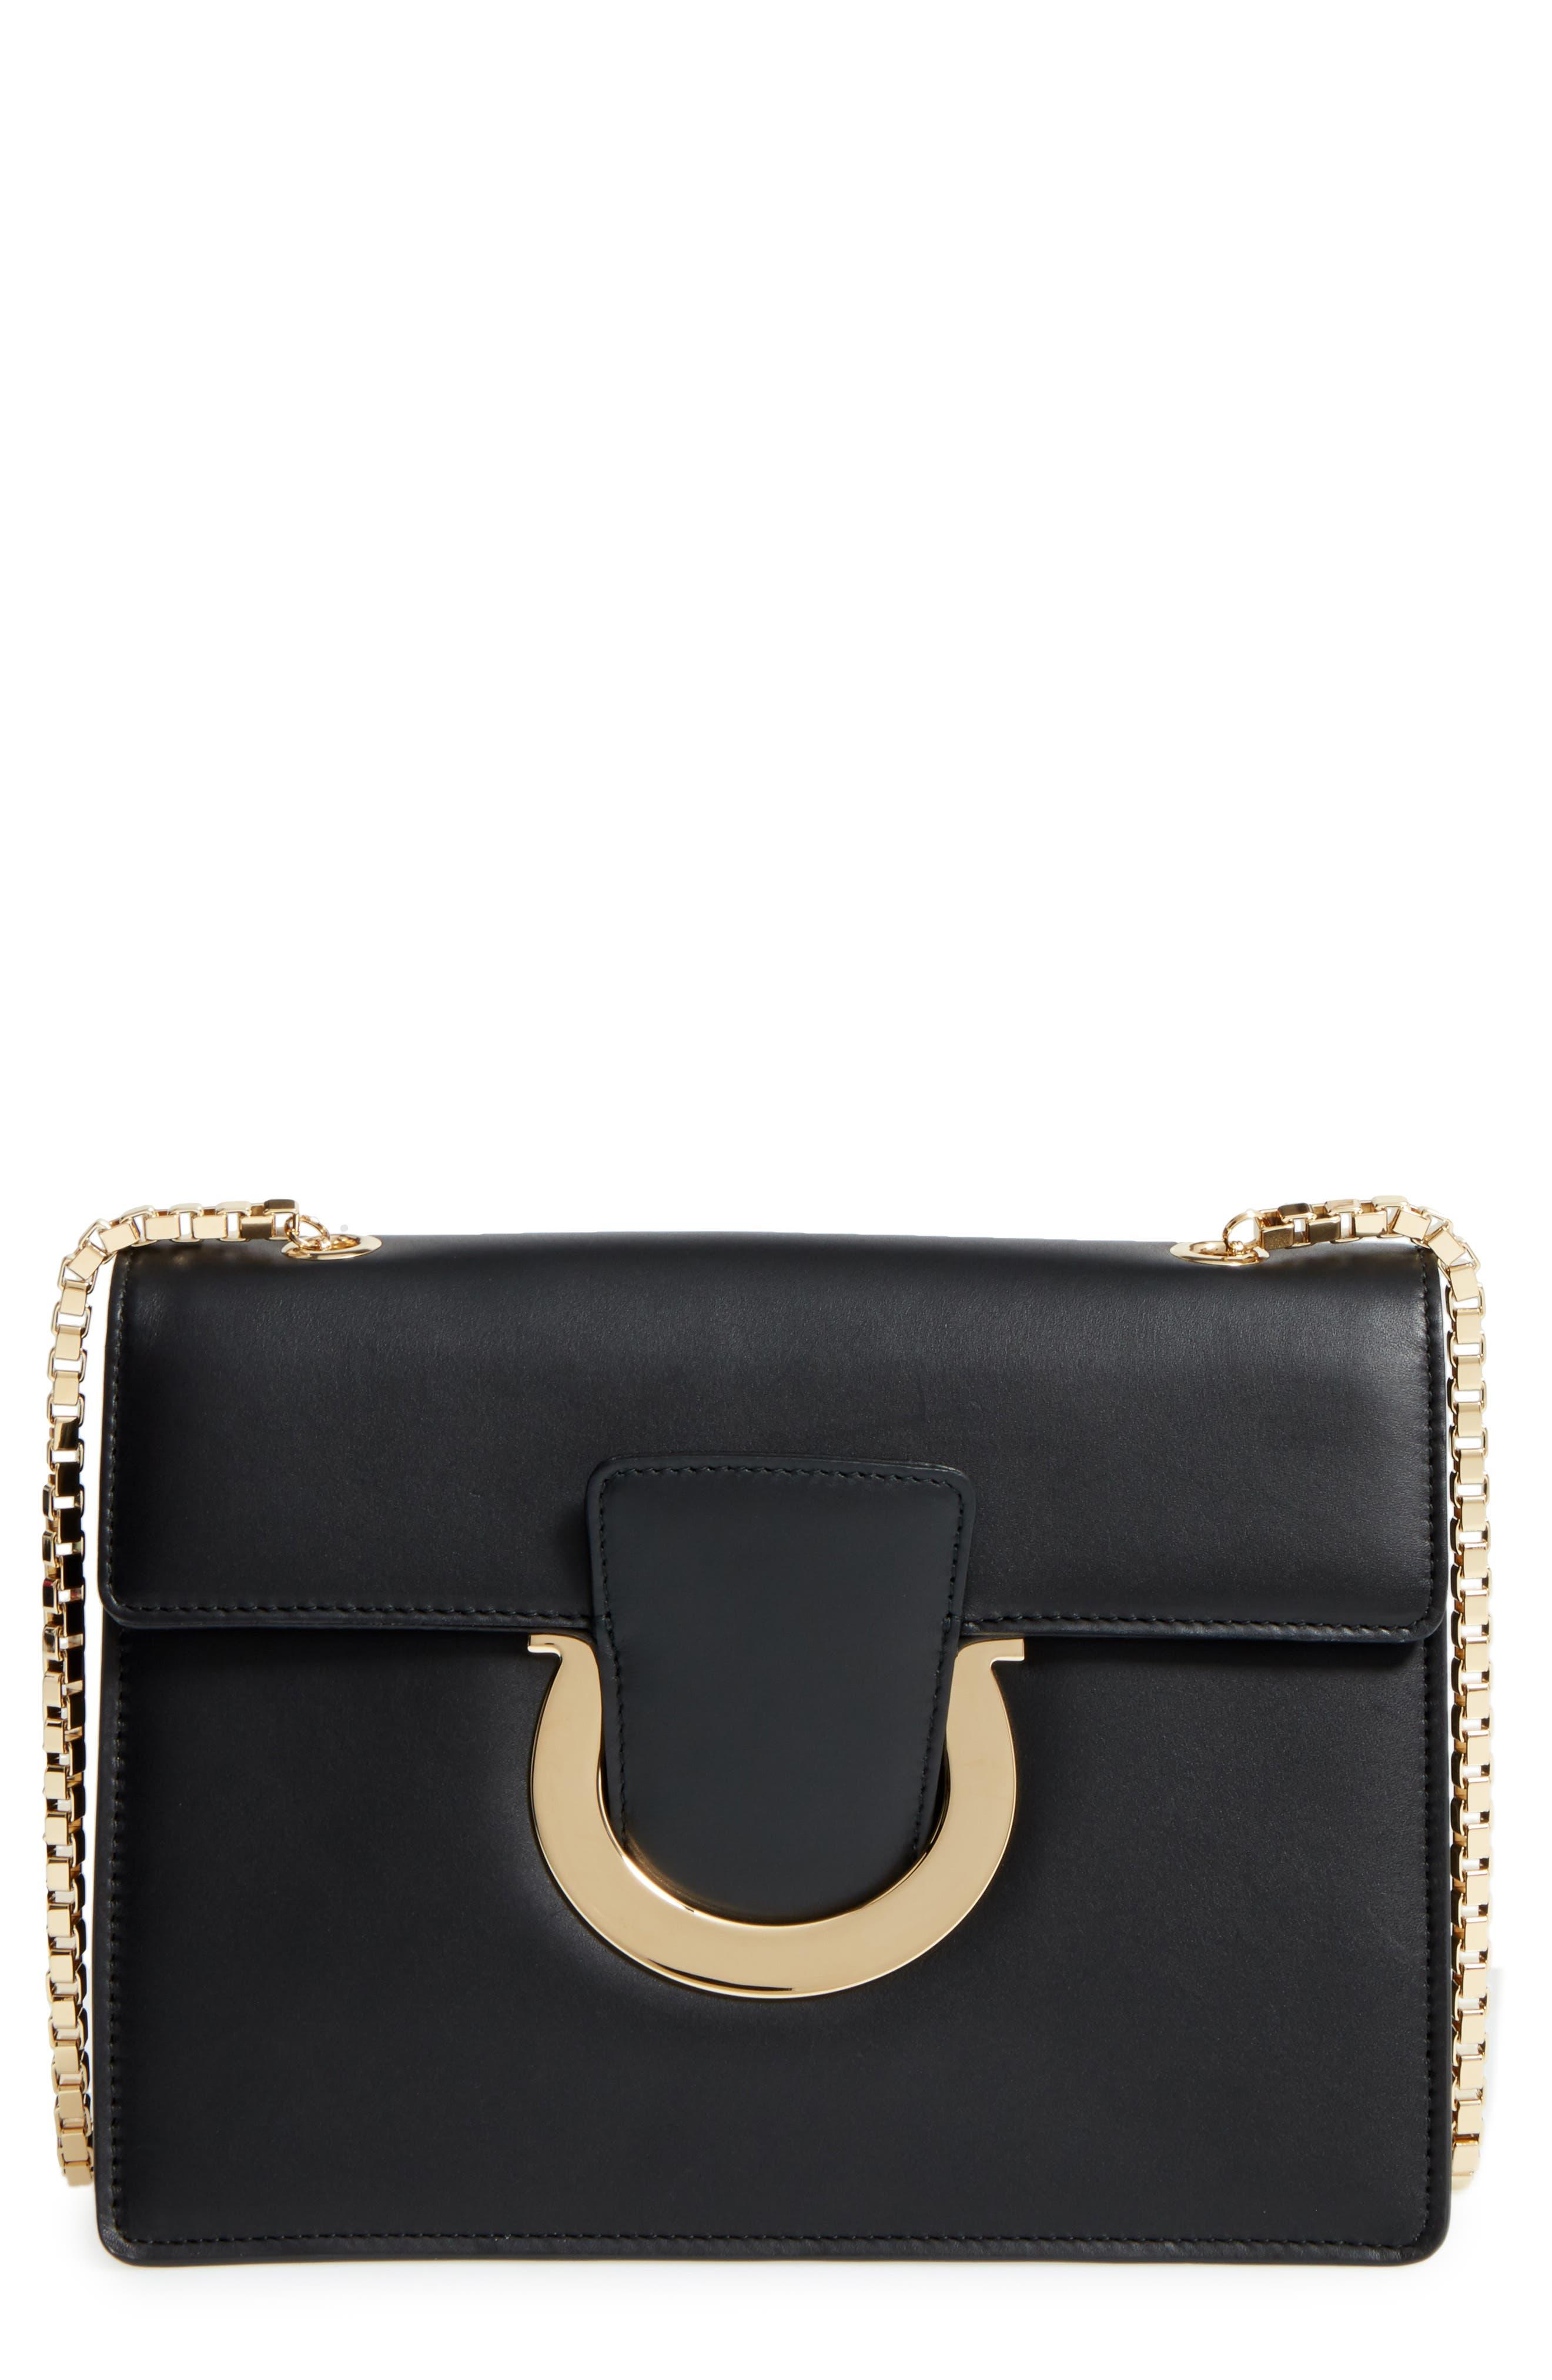 Salvatore Ferragamo Large Thalia Leather Shoulder Bag